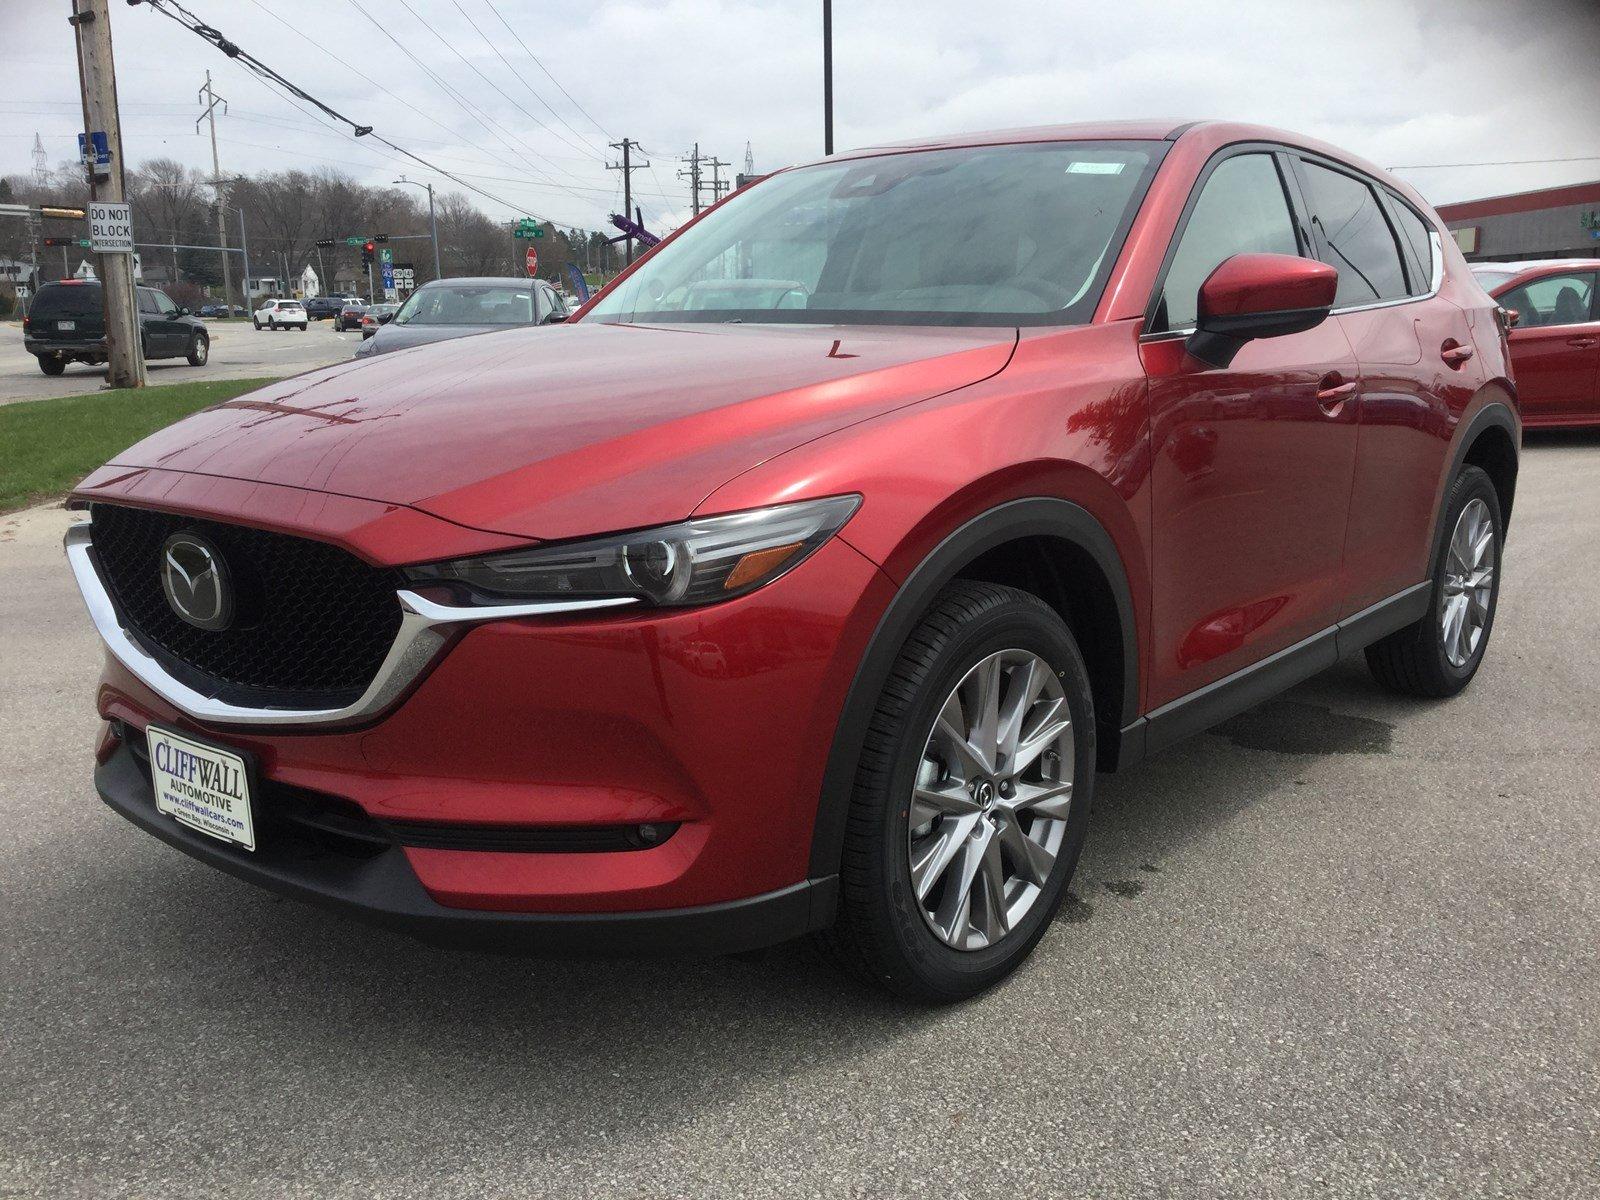 New 2019 Mazda Mazda CX-5 For Sale at Cliff Wall Automotive